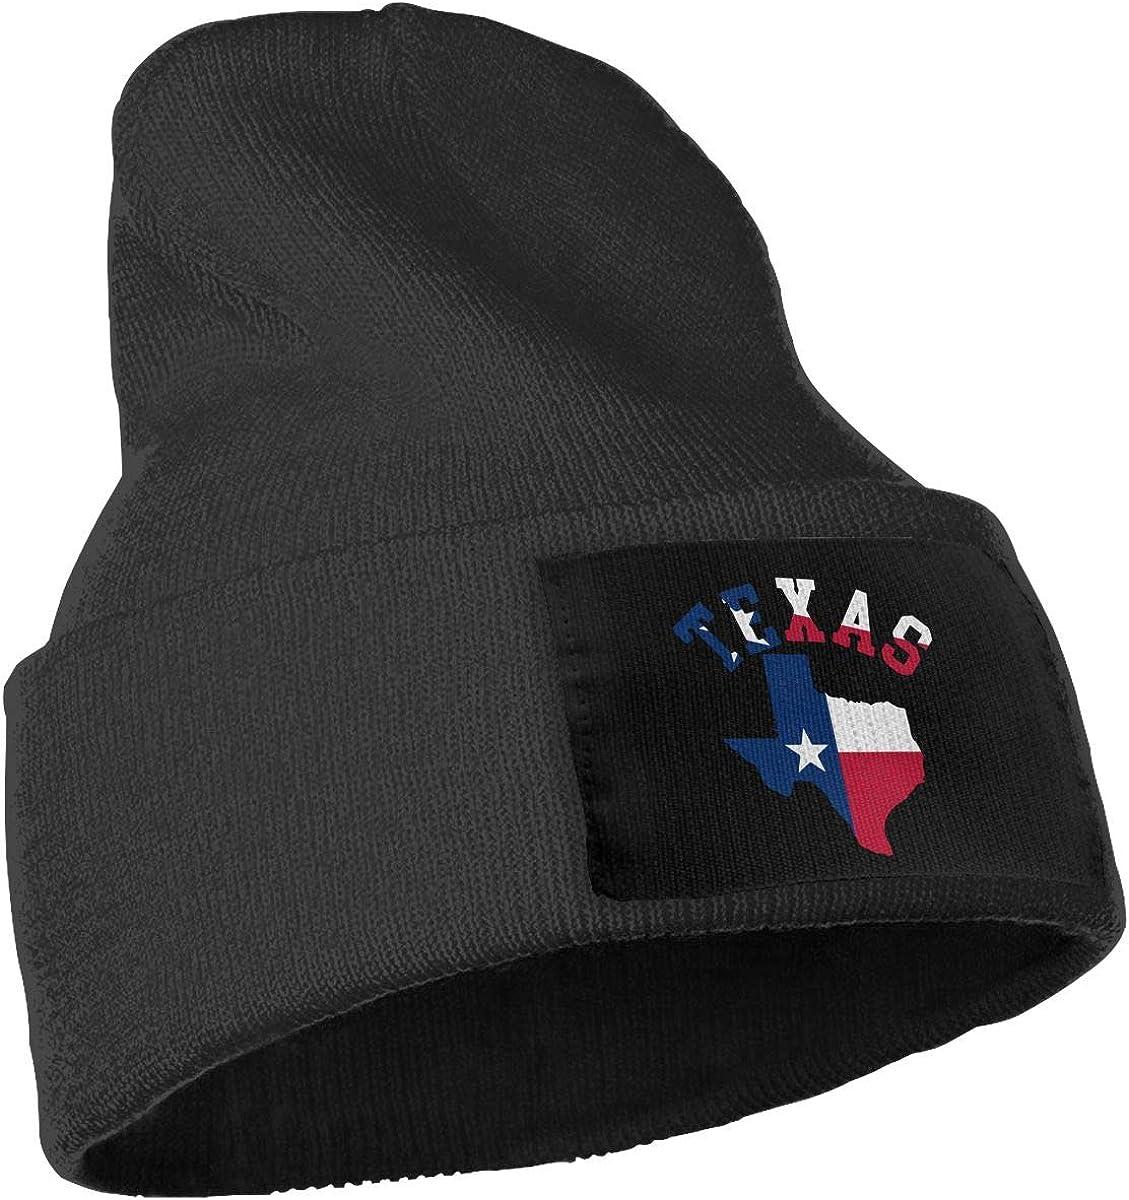 COLLJL-8 Men /& Women Texas Flag Outdoor Stretch Knit Beanies Hat Soft Winter Skull Caps